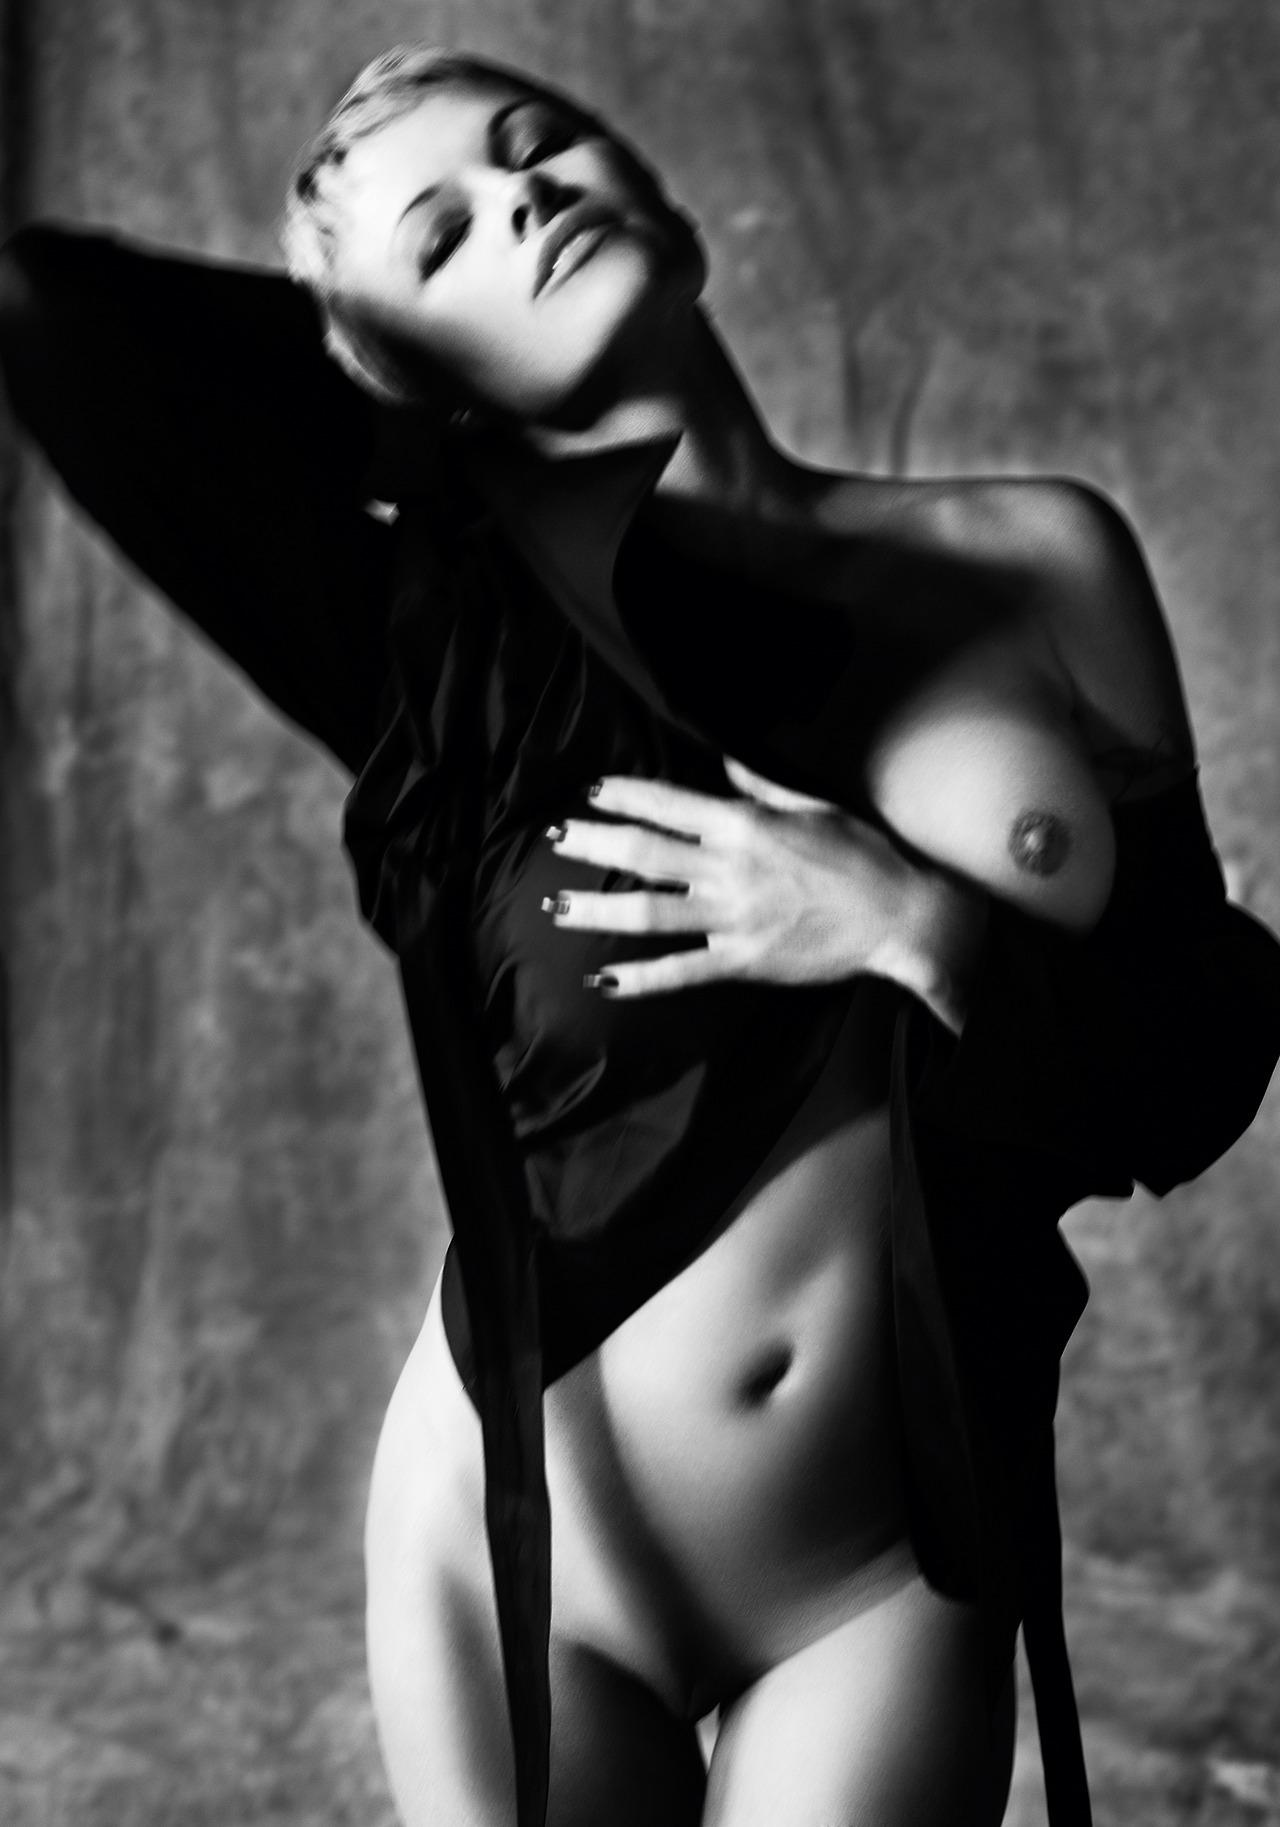 Найти фотомодель для фотосъемки обнаженки #12